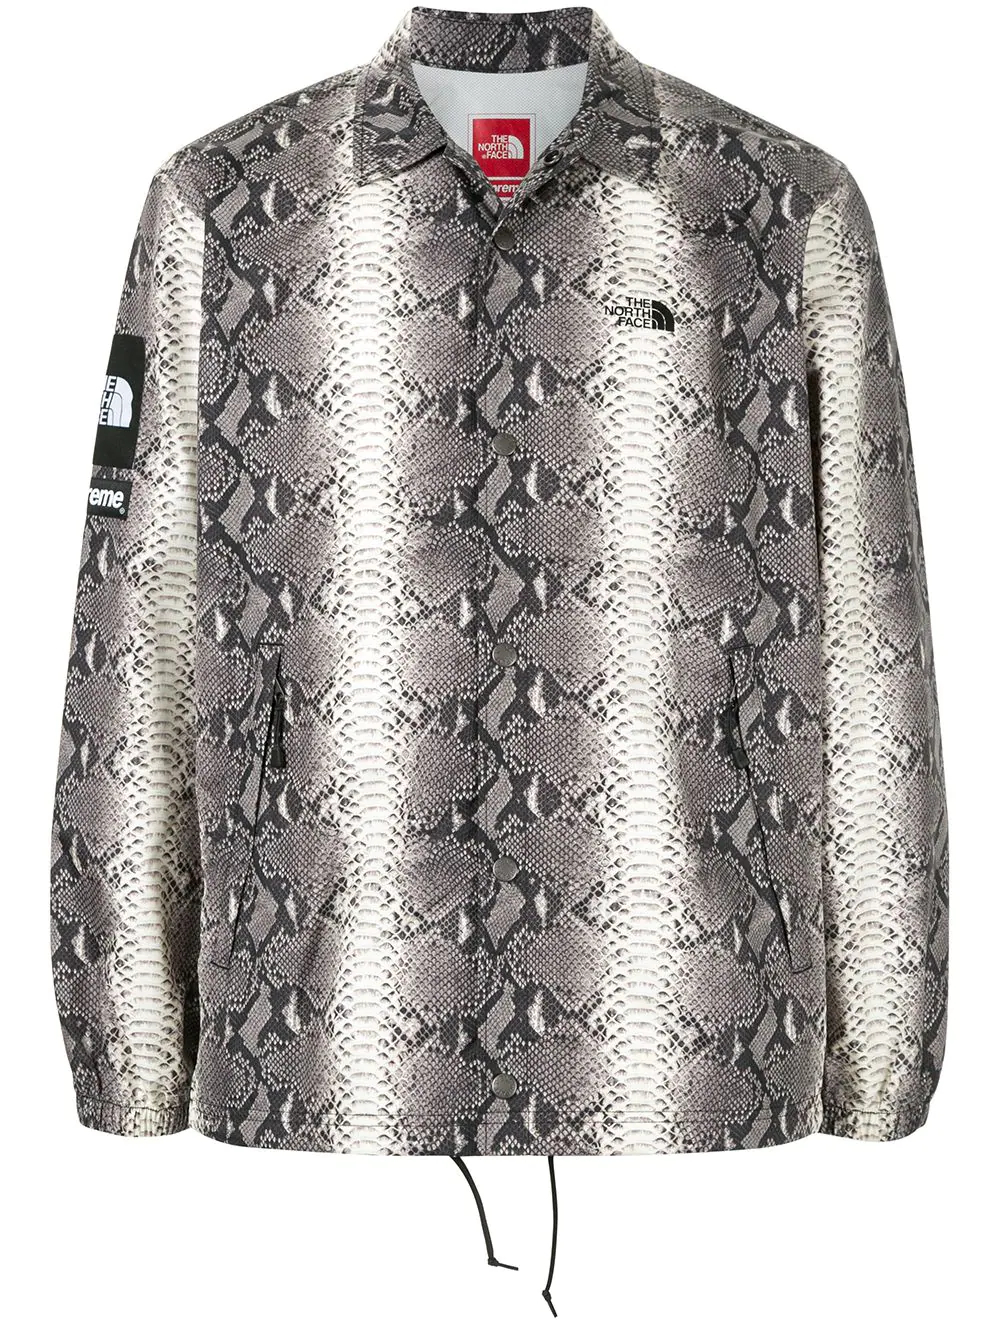 Supreme | Supreme спортивная куртка TNF со змеиным принтом | Clouty